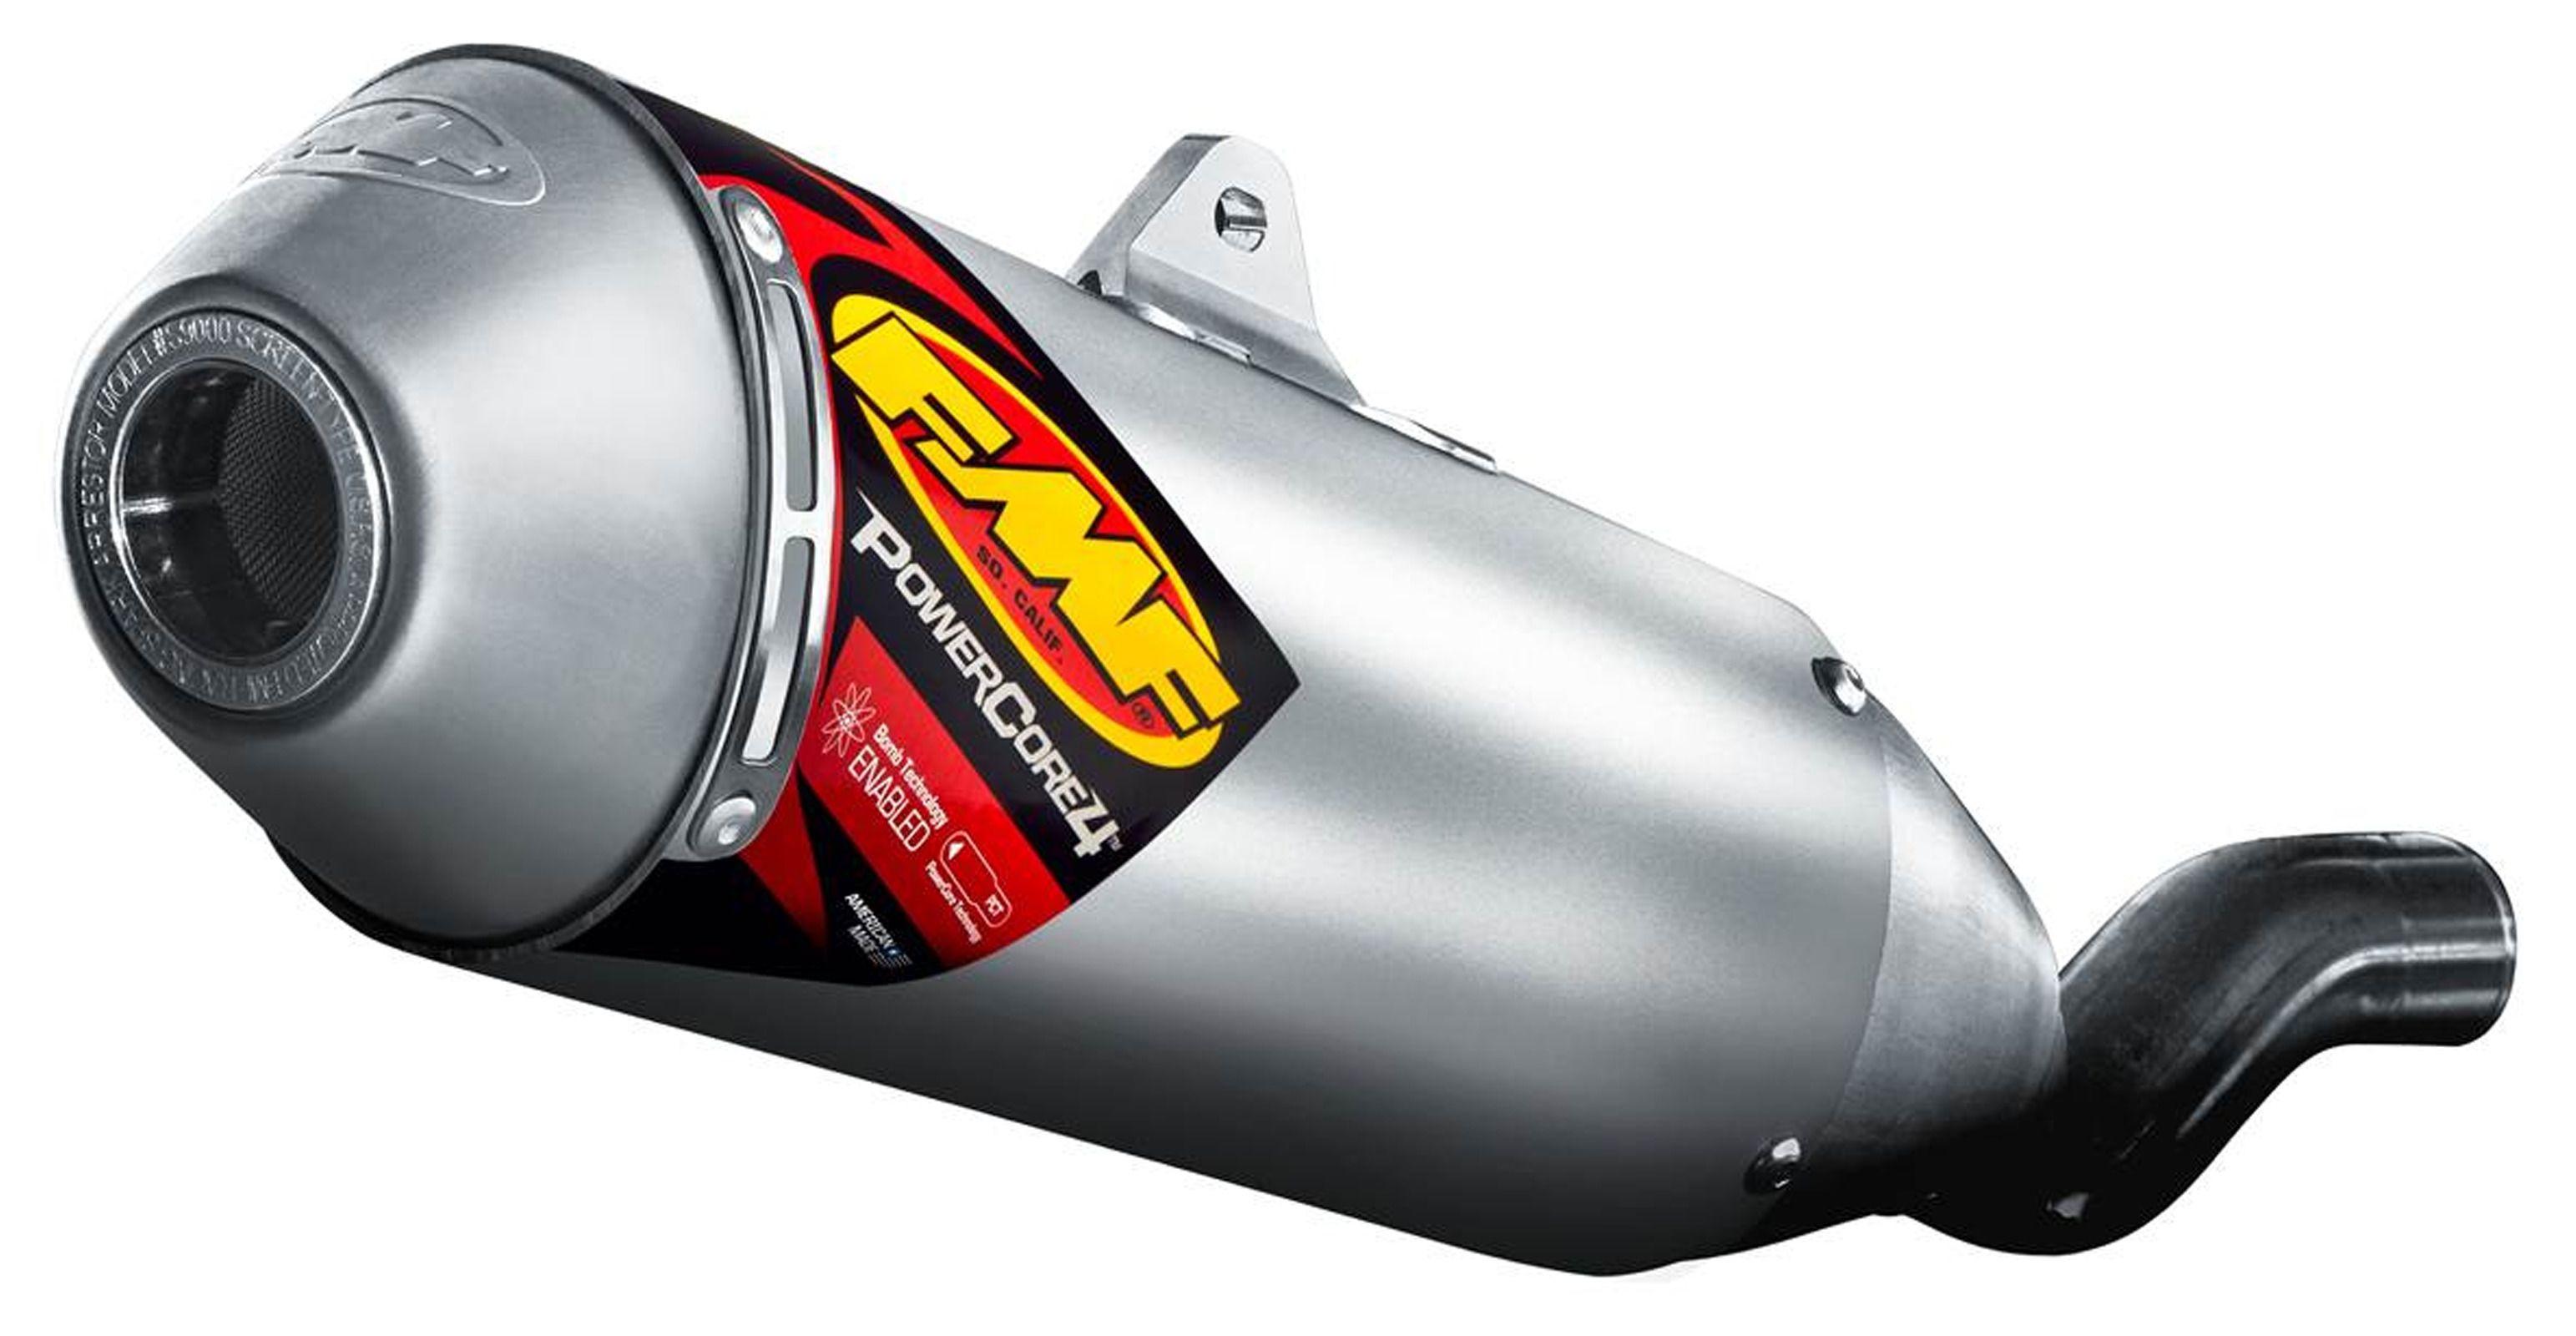 FMF PowerCore 4 Slip-On Exhaust Yamaha YZ426F / YZ400F / WR400F / WR426F  1998-2001 | 10% ($35 00) Off!